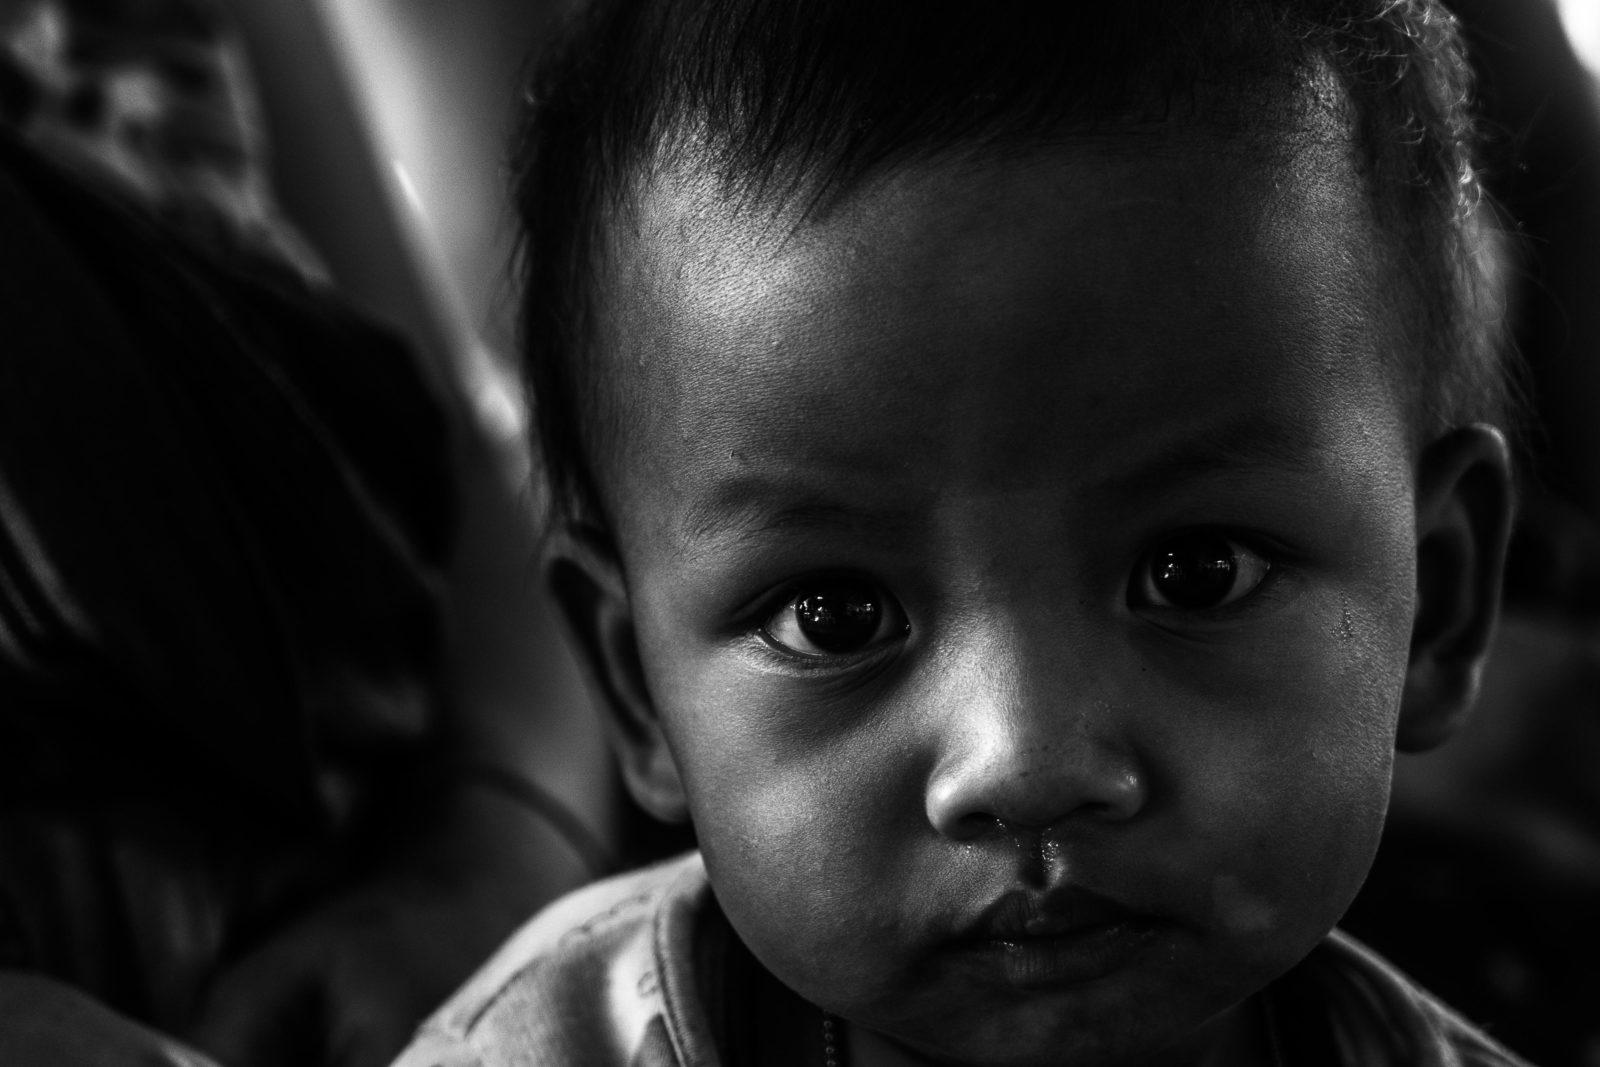 bambino karen in clinica